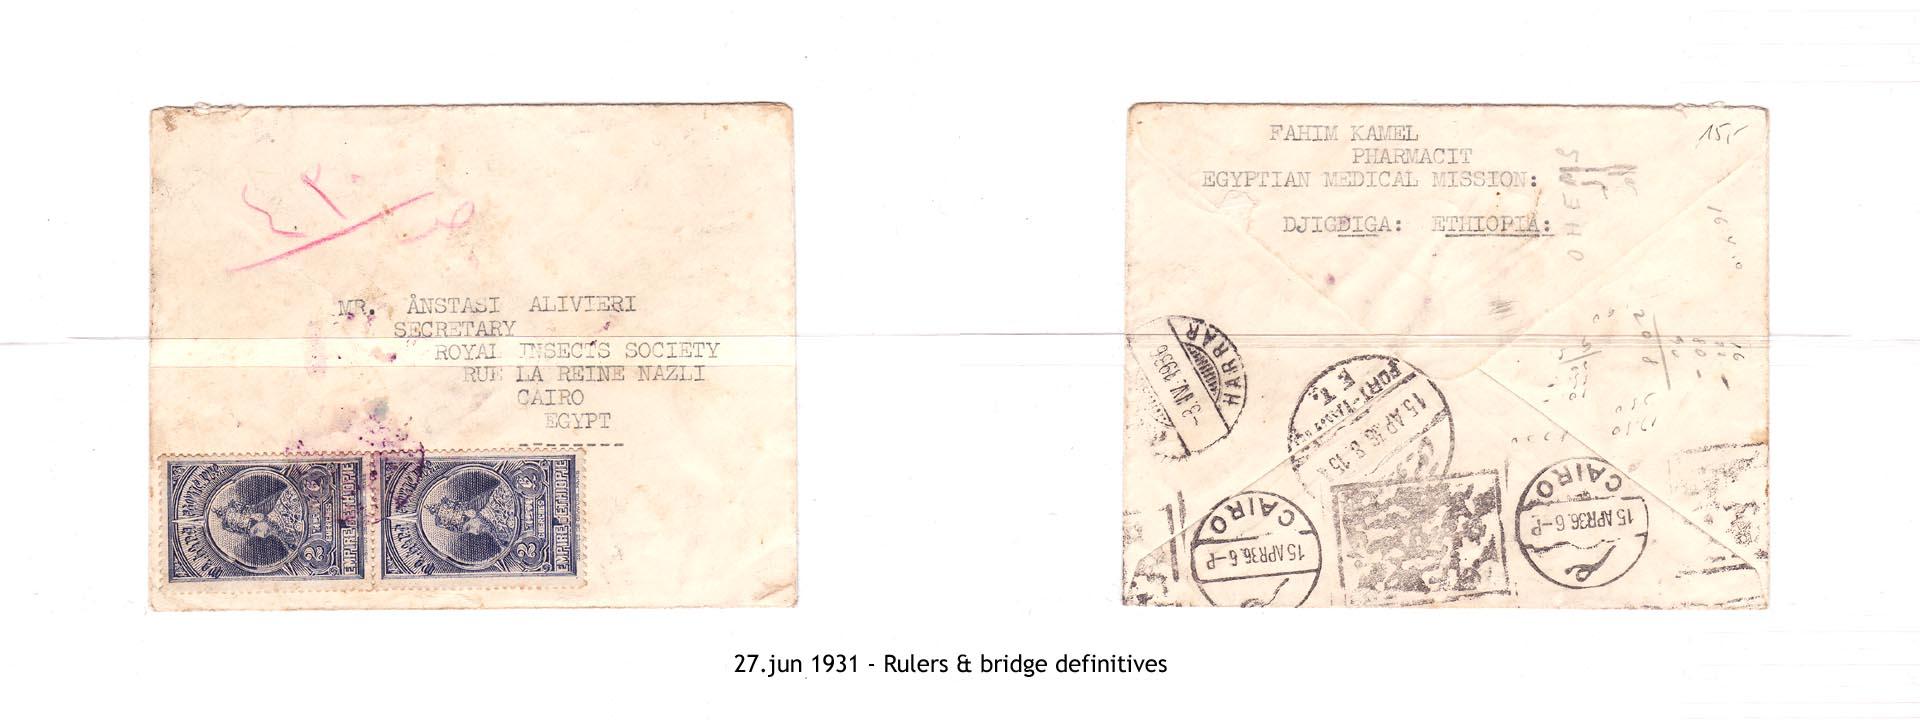 19310627 - Rulers & bridge definitives